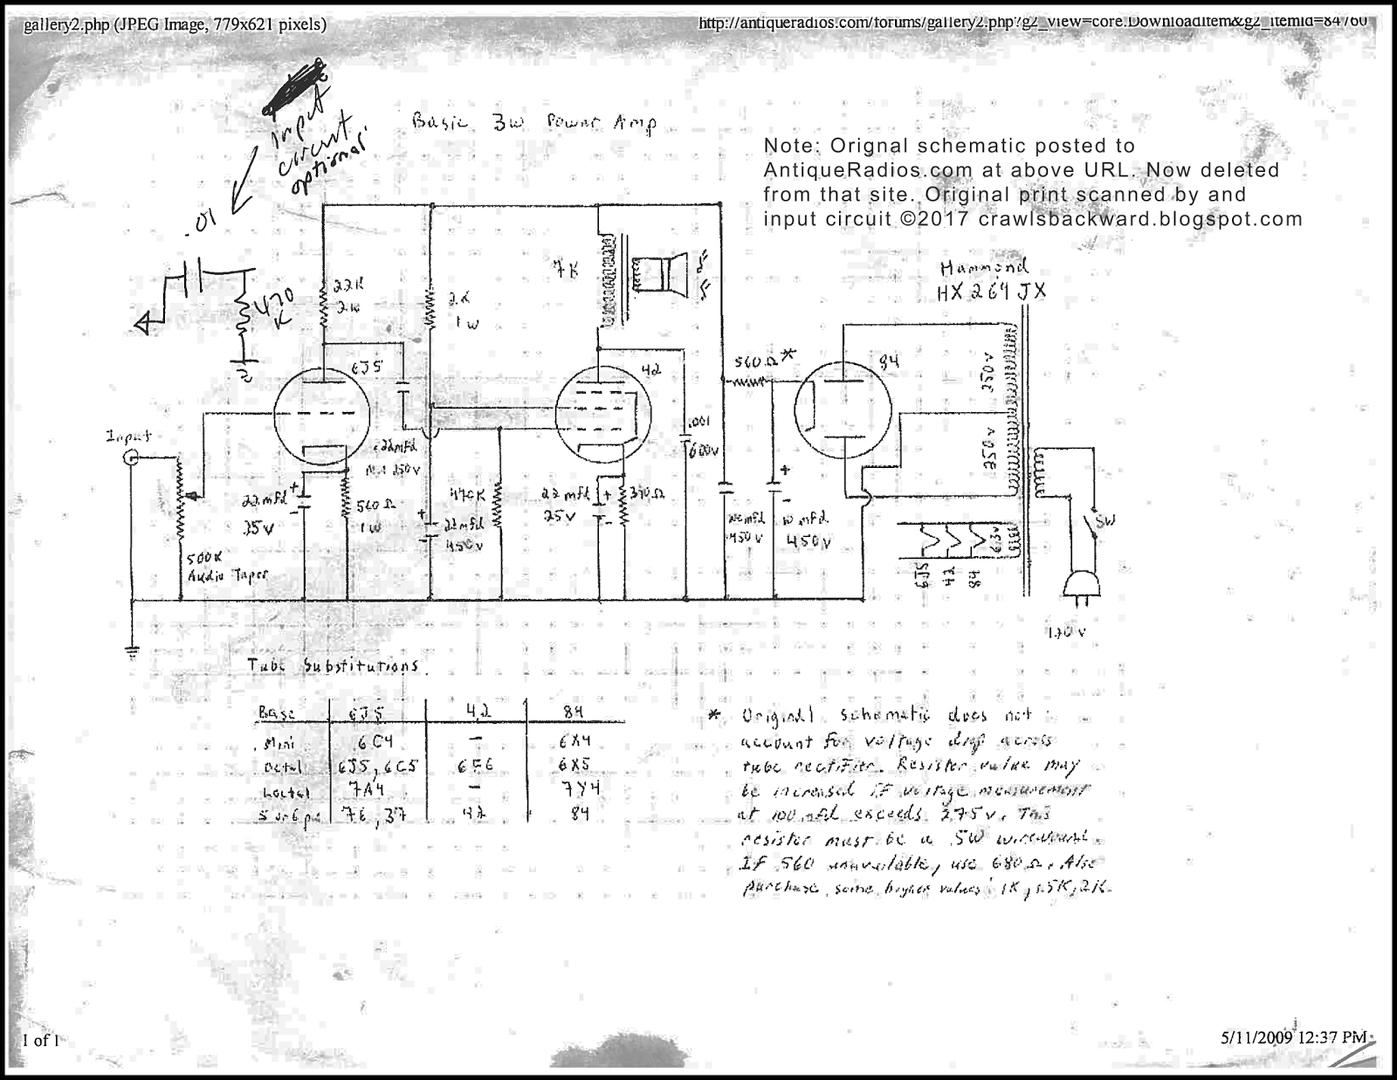 basic-3-watt-tube-amp-schematic-42-output.png